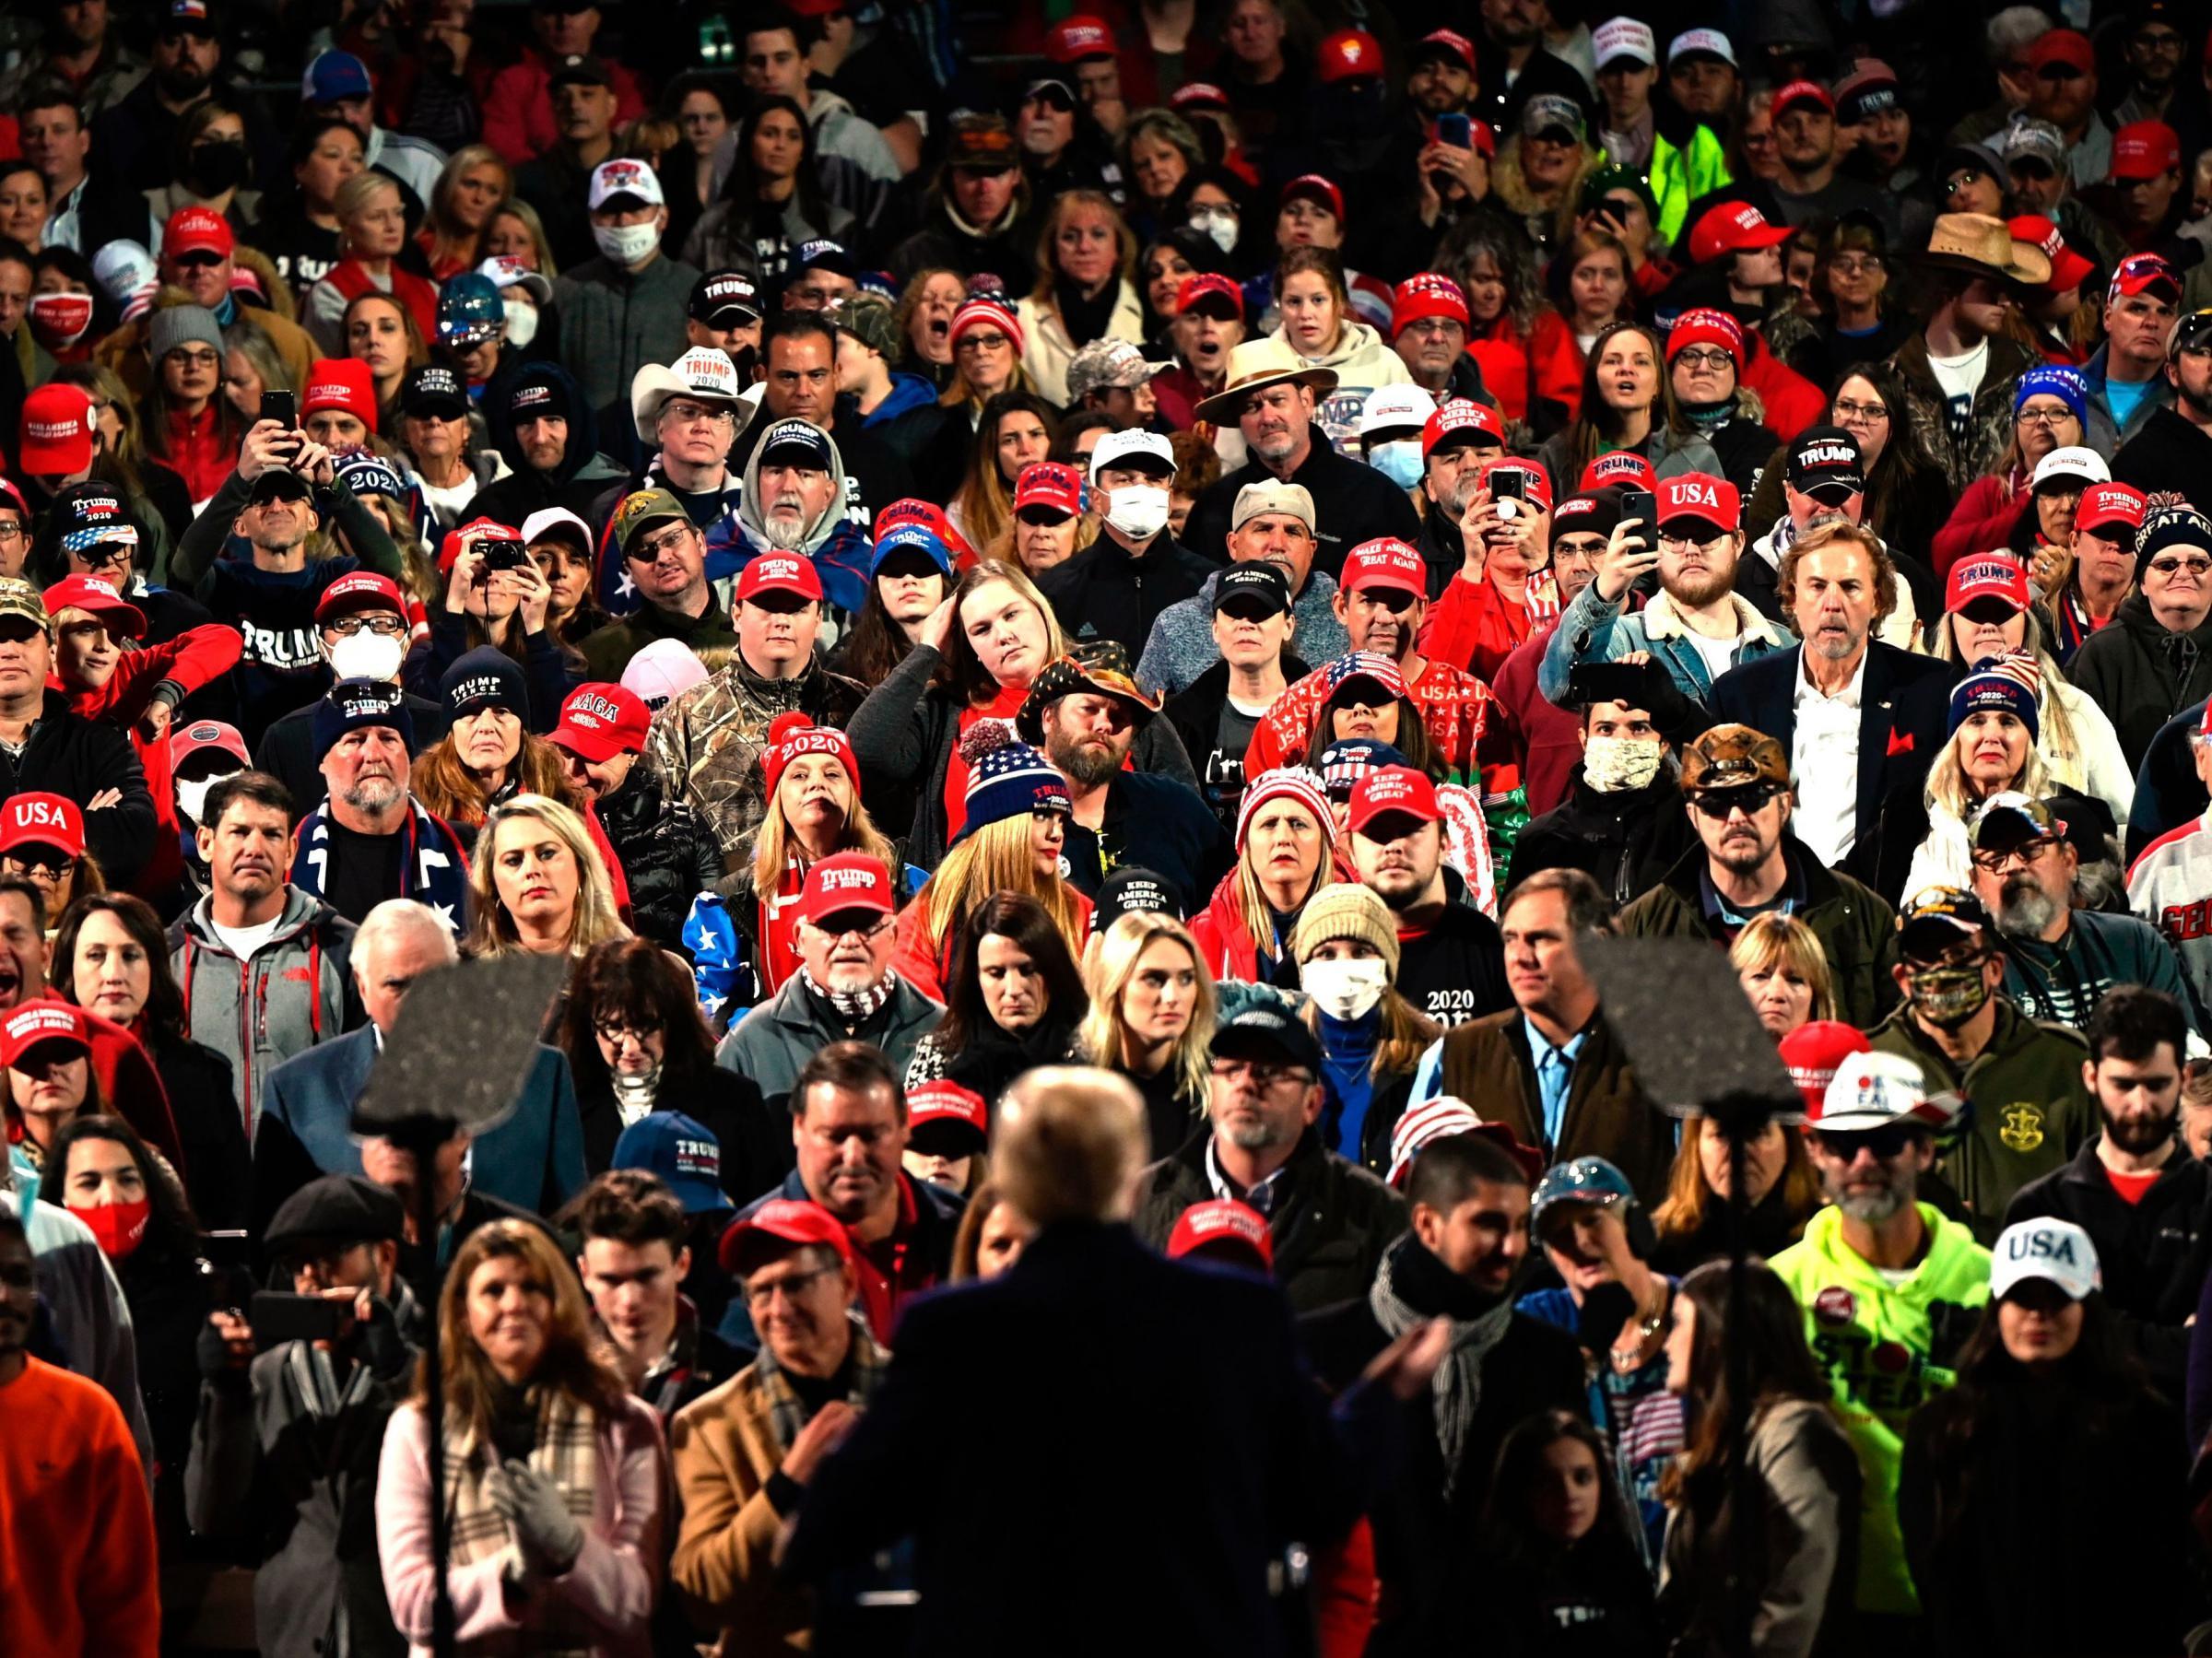 Trump repeats voter fraud claim at Georgia rally